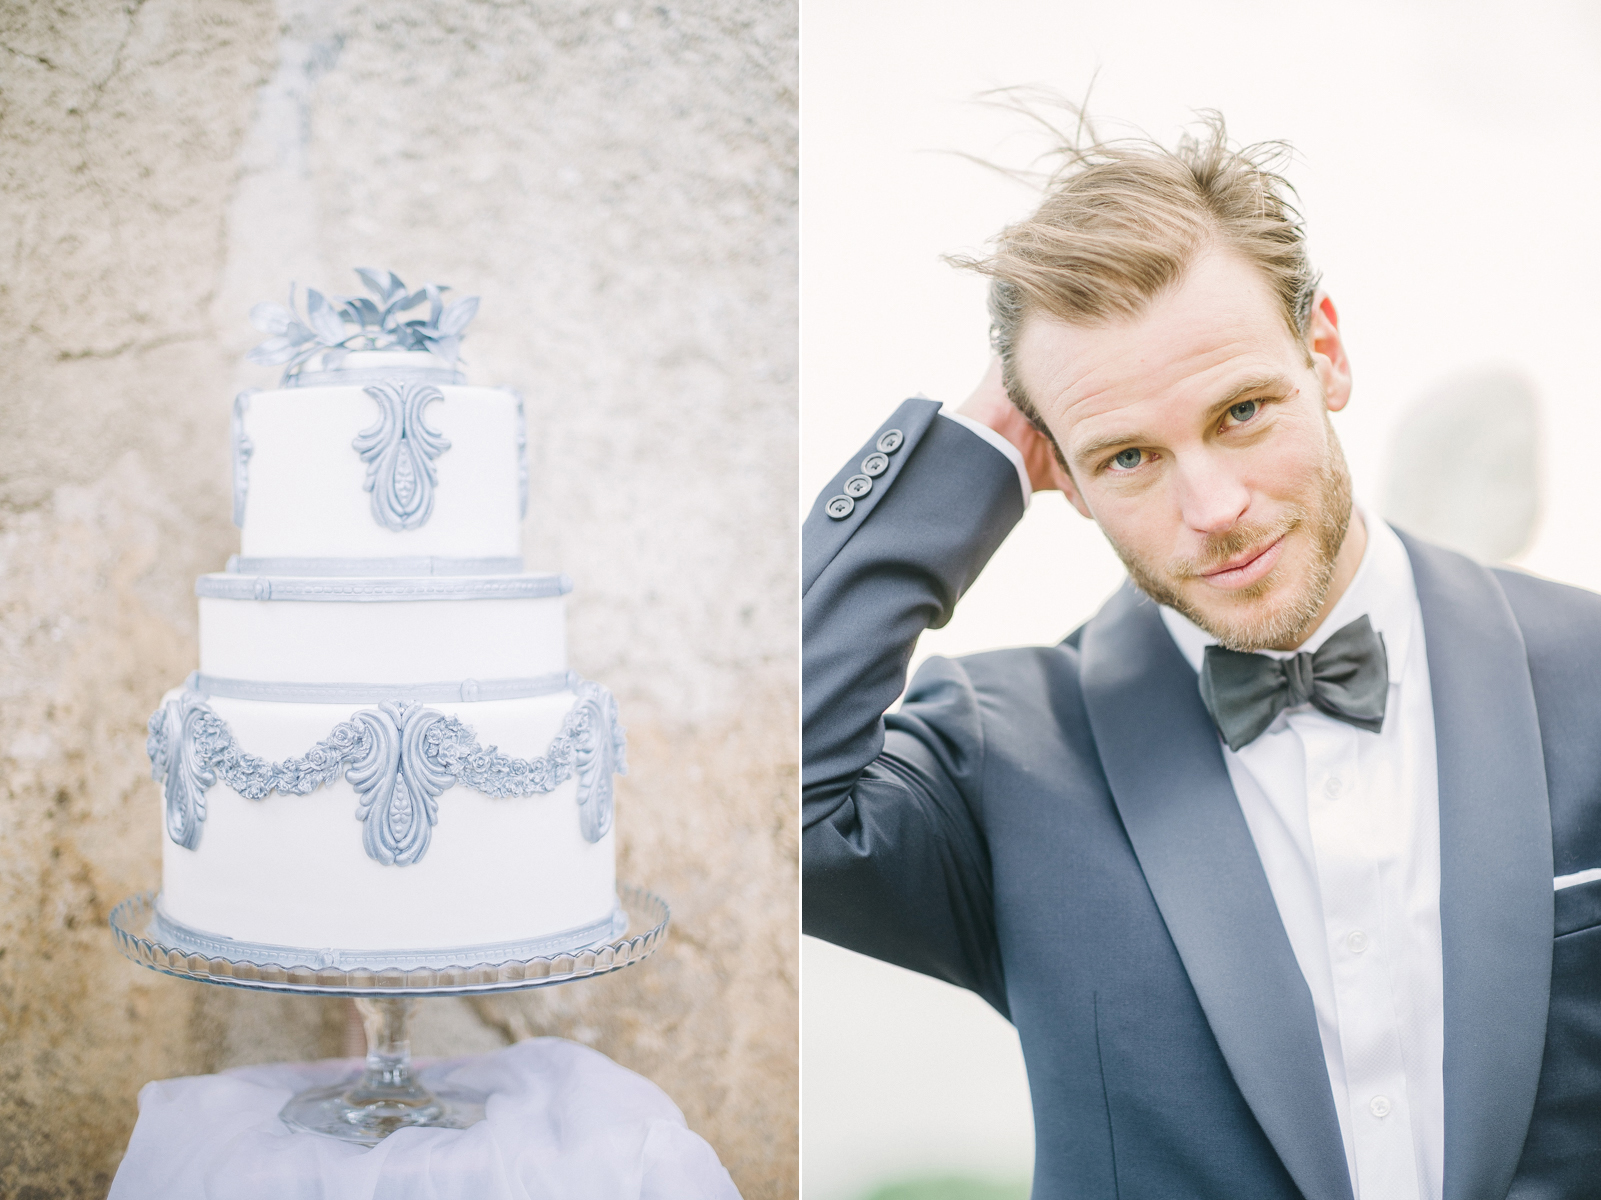 Boheme-Moon-wedding-photography-ravello-italy_15.jpg